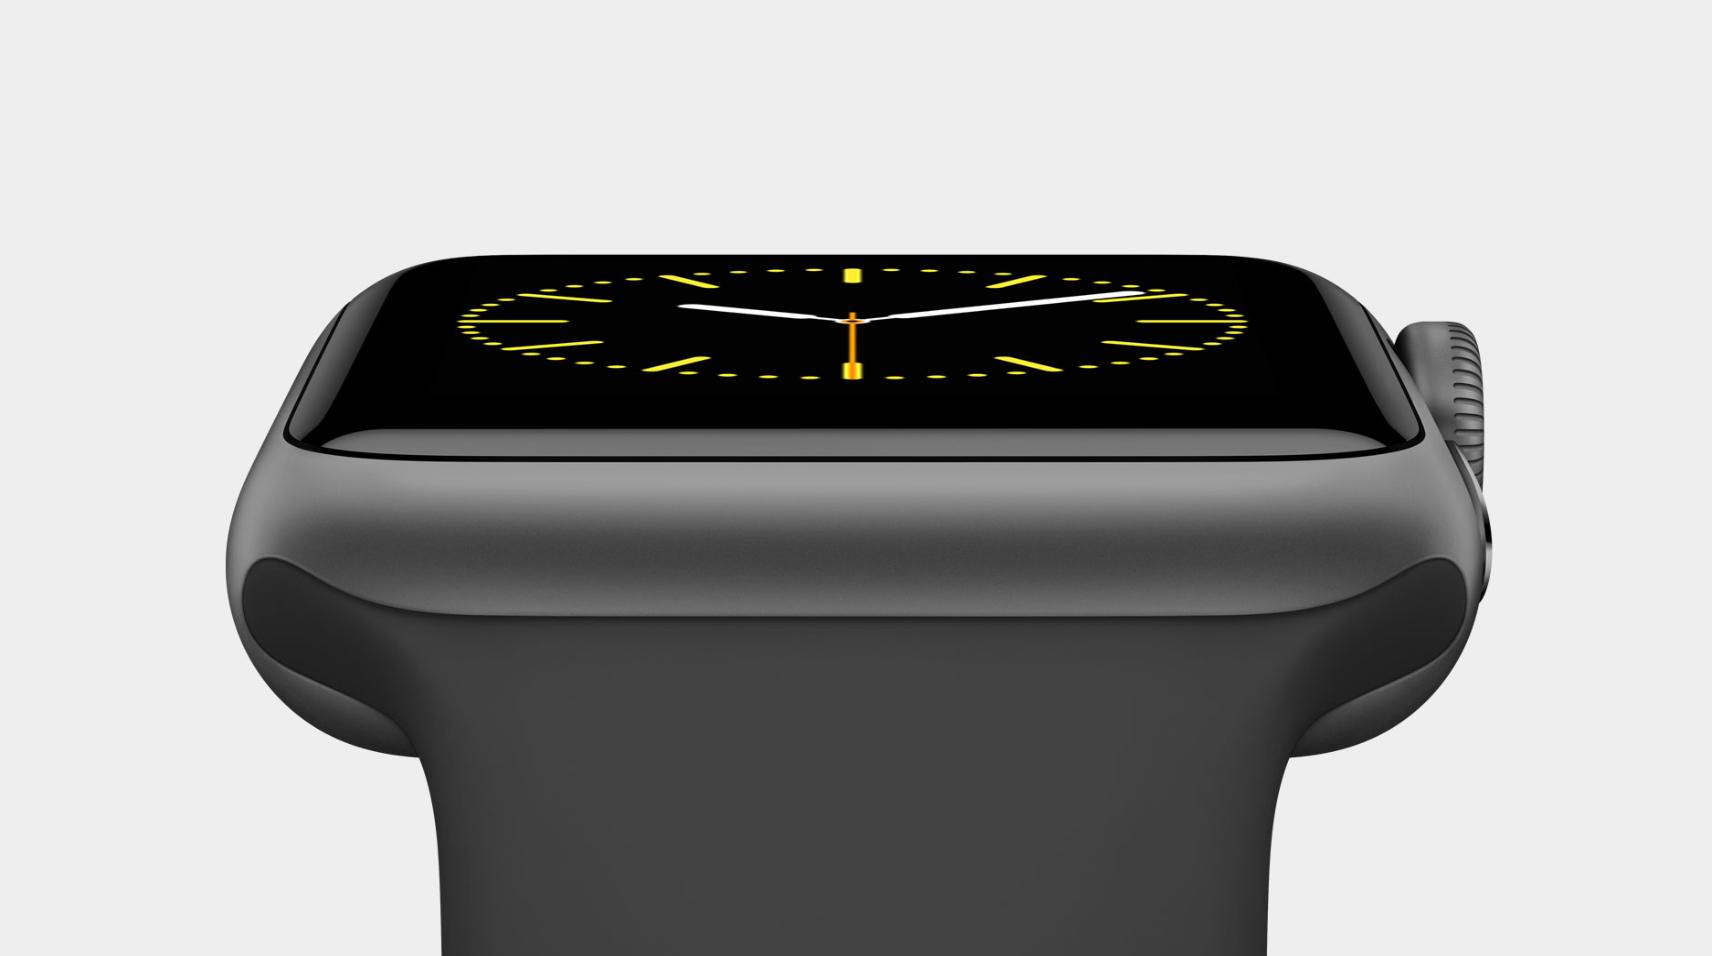 apple watch tagebuch teil 3 beyond pixels. Black Bedroom Furniture Sets. Home Design Ideas